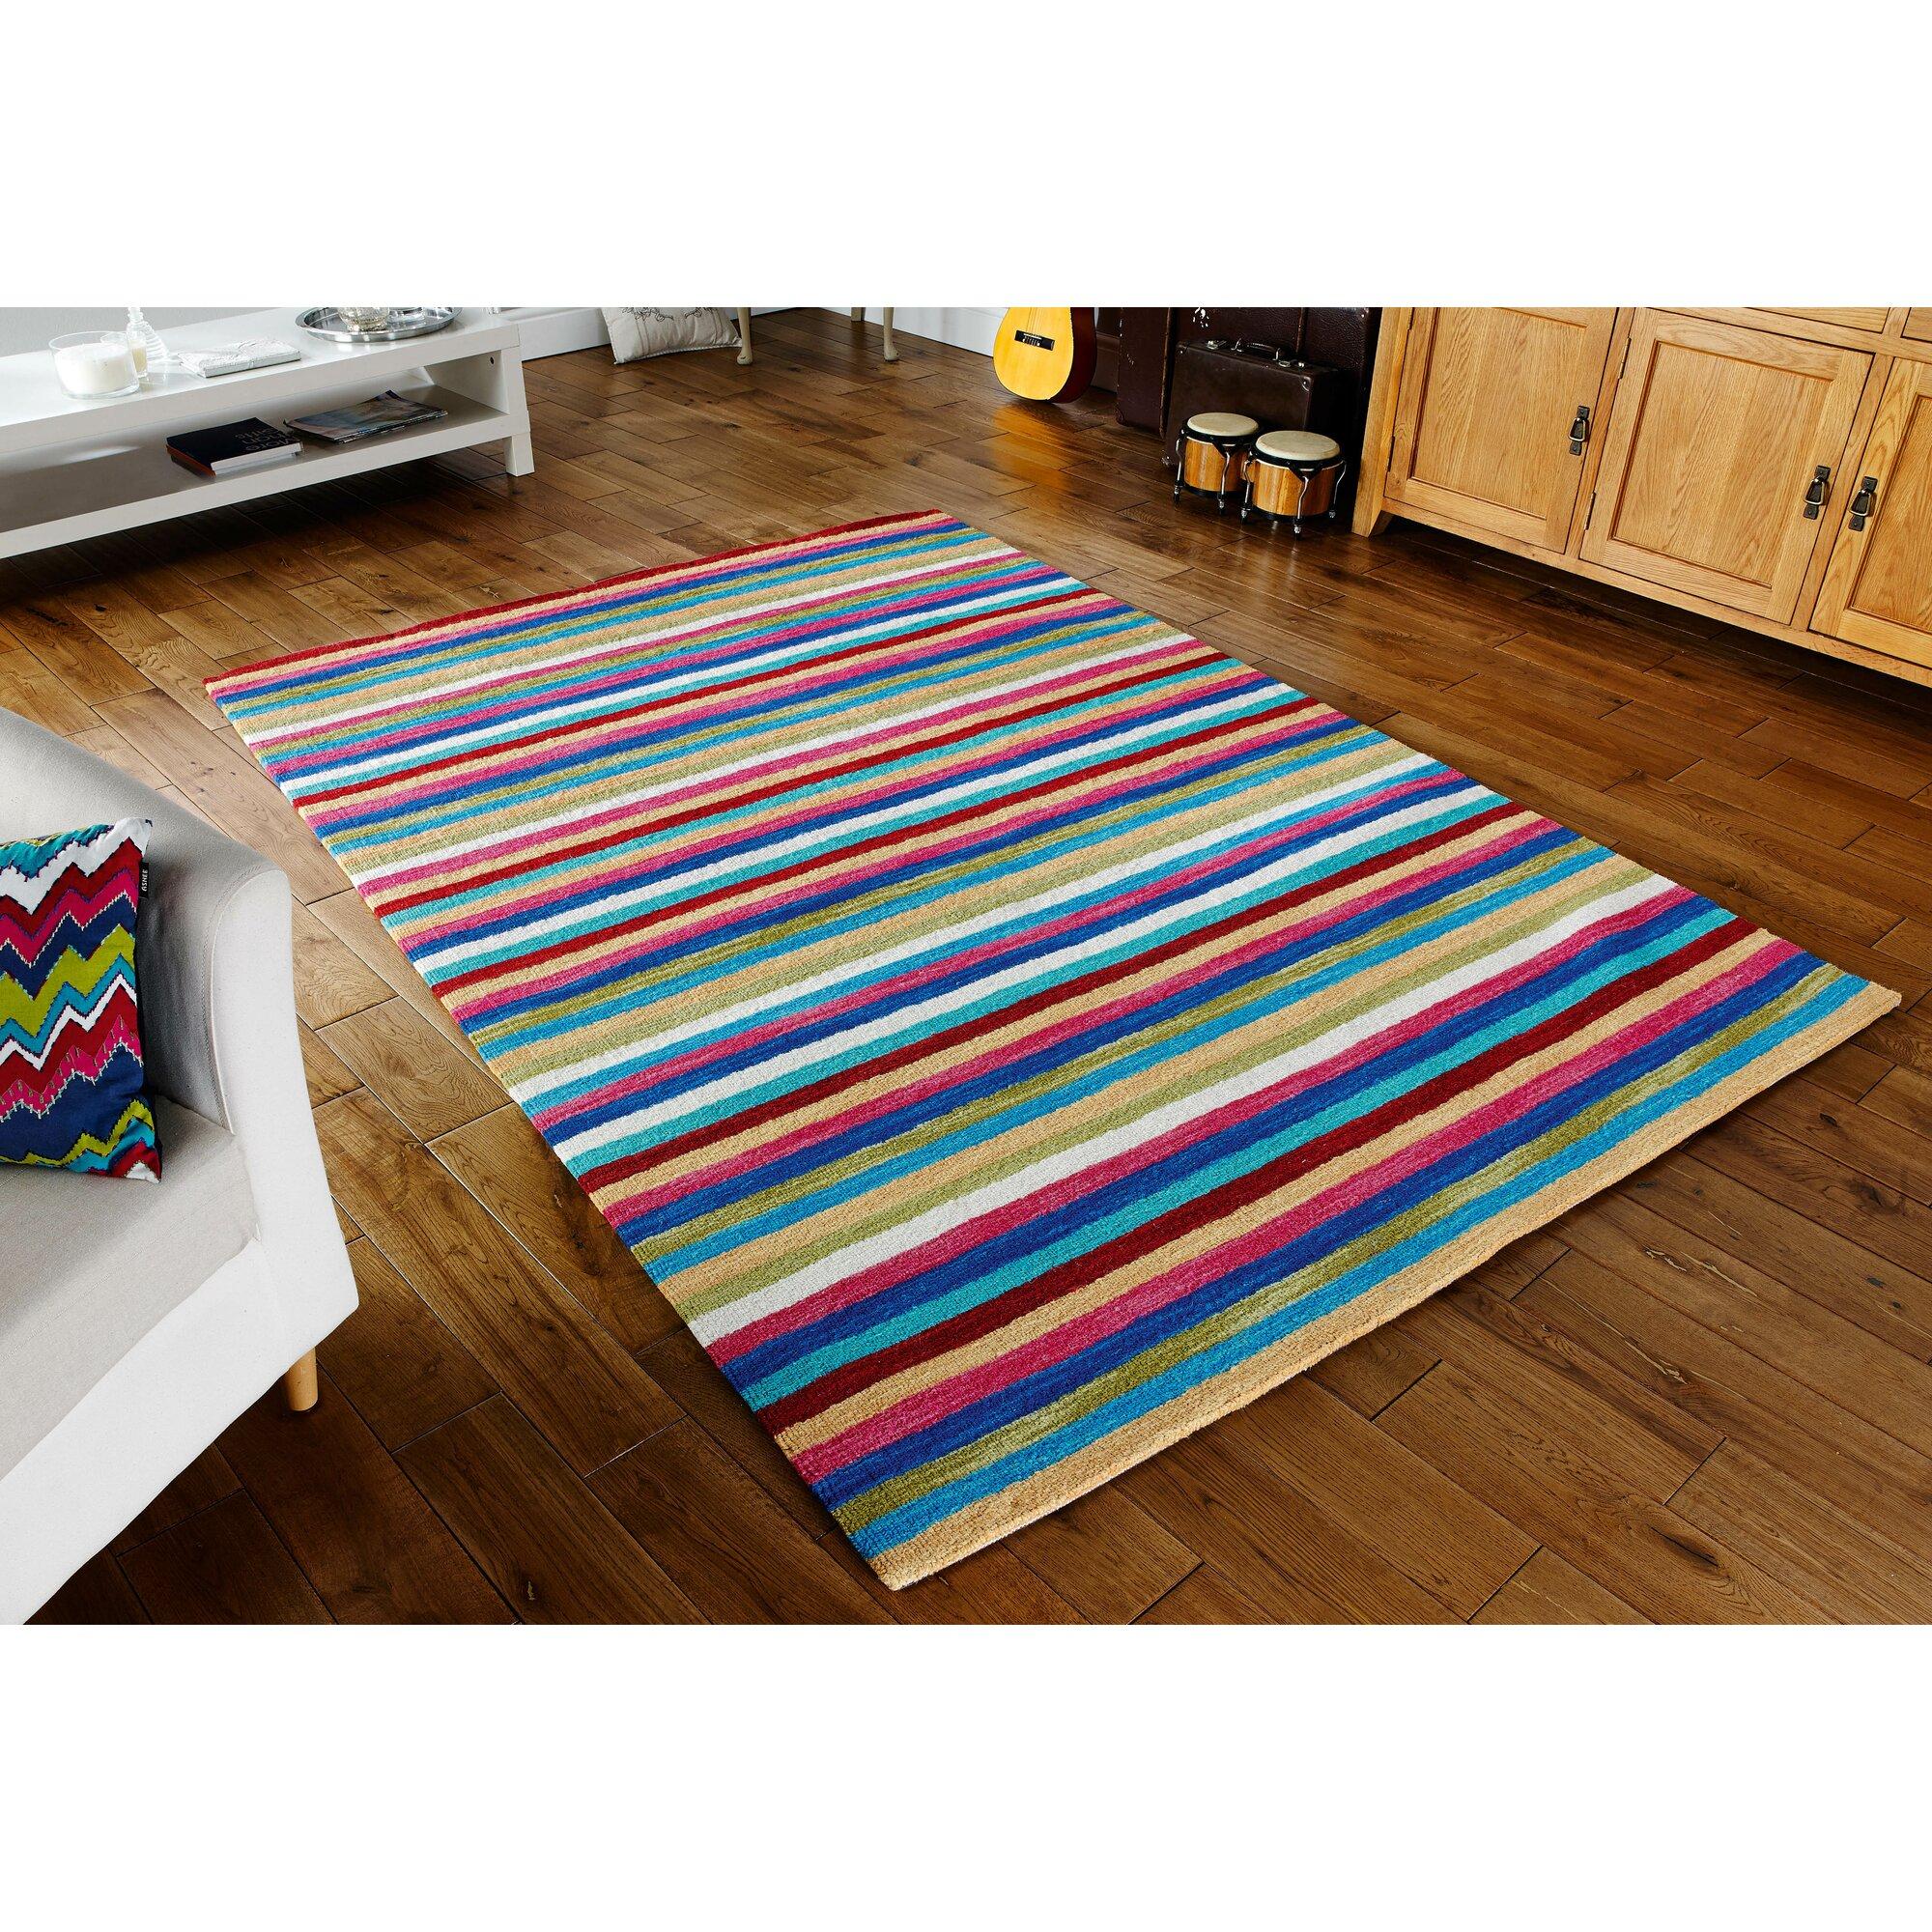 caracella handgewebter wolle teppich vesta in bunt bewertungen. Black Bedroom Furniture Sets. Home Design Ideas